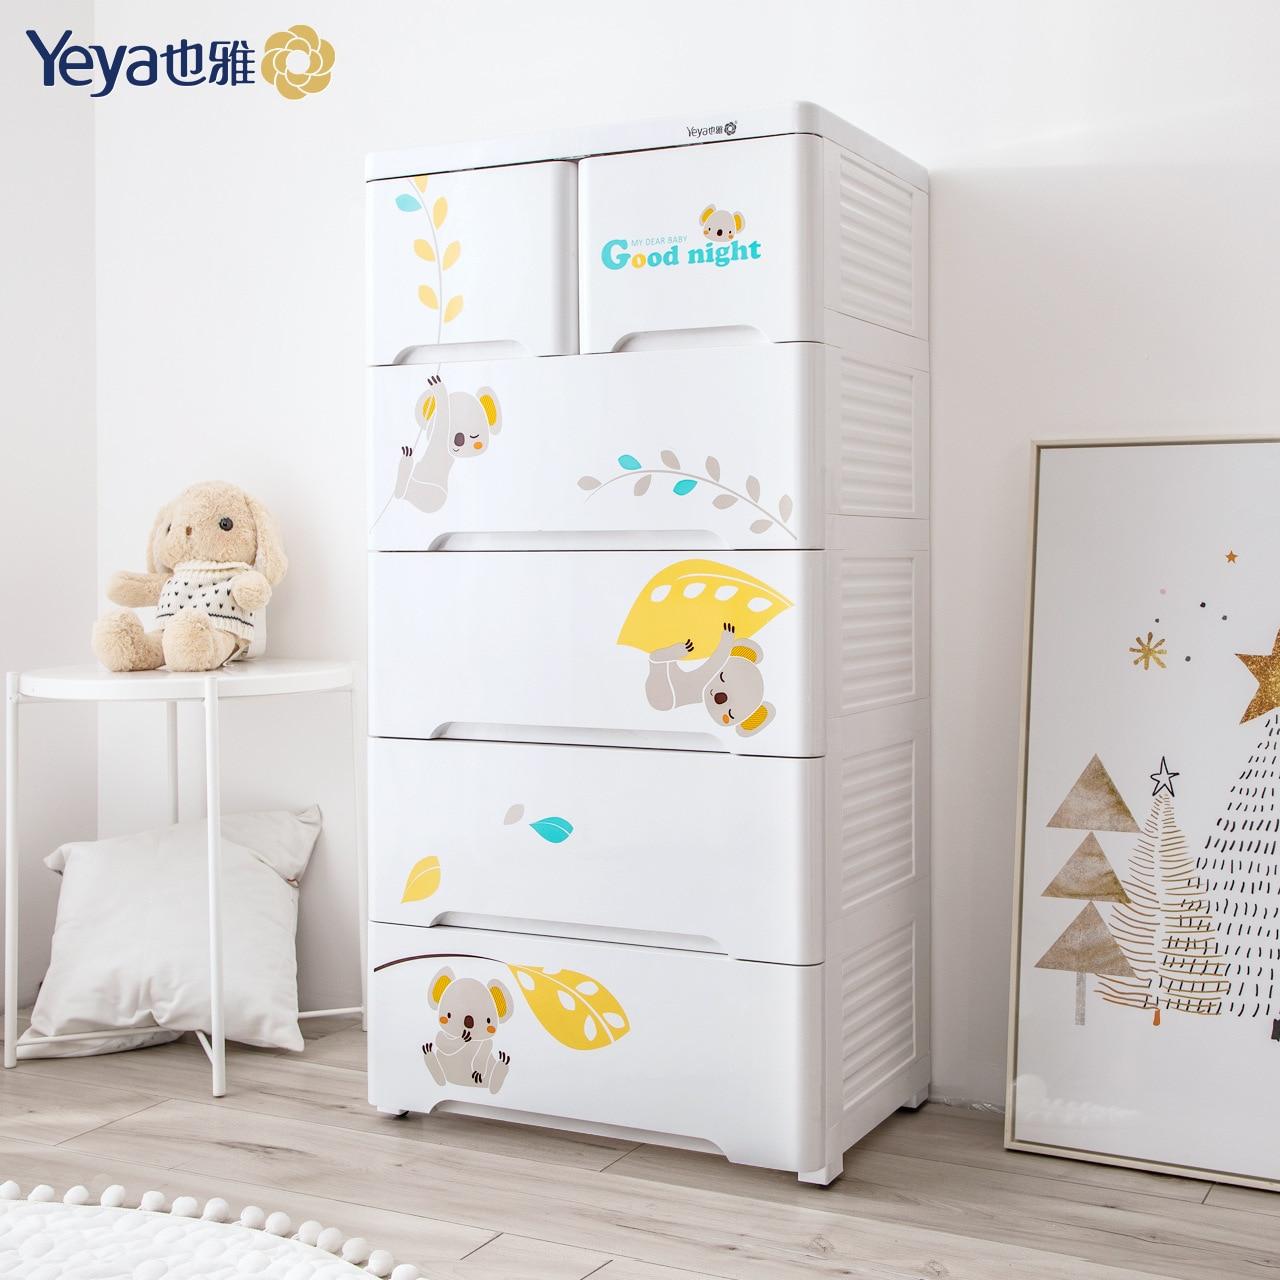 Y خزانة بلاستيكية الطفل درج خزانة الأطفال تخزين سميكة بسيطة متعددة الطبقات التشطيب